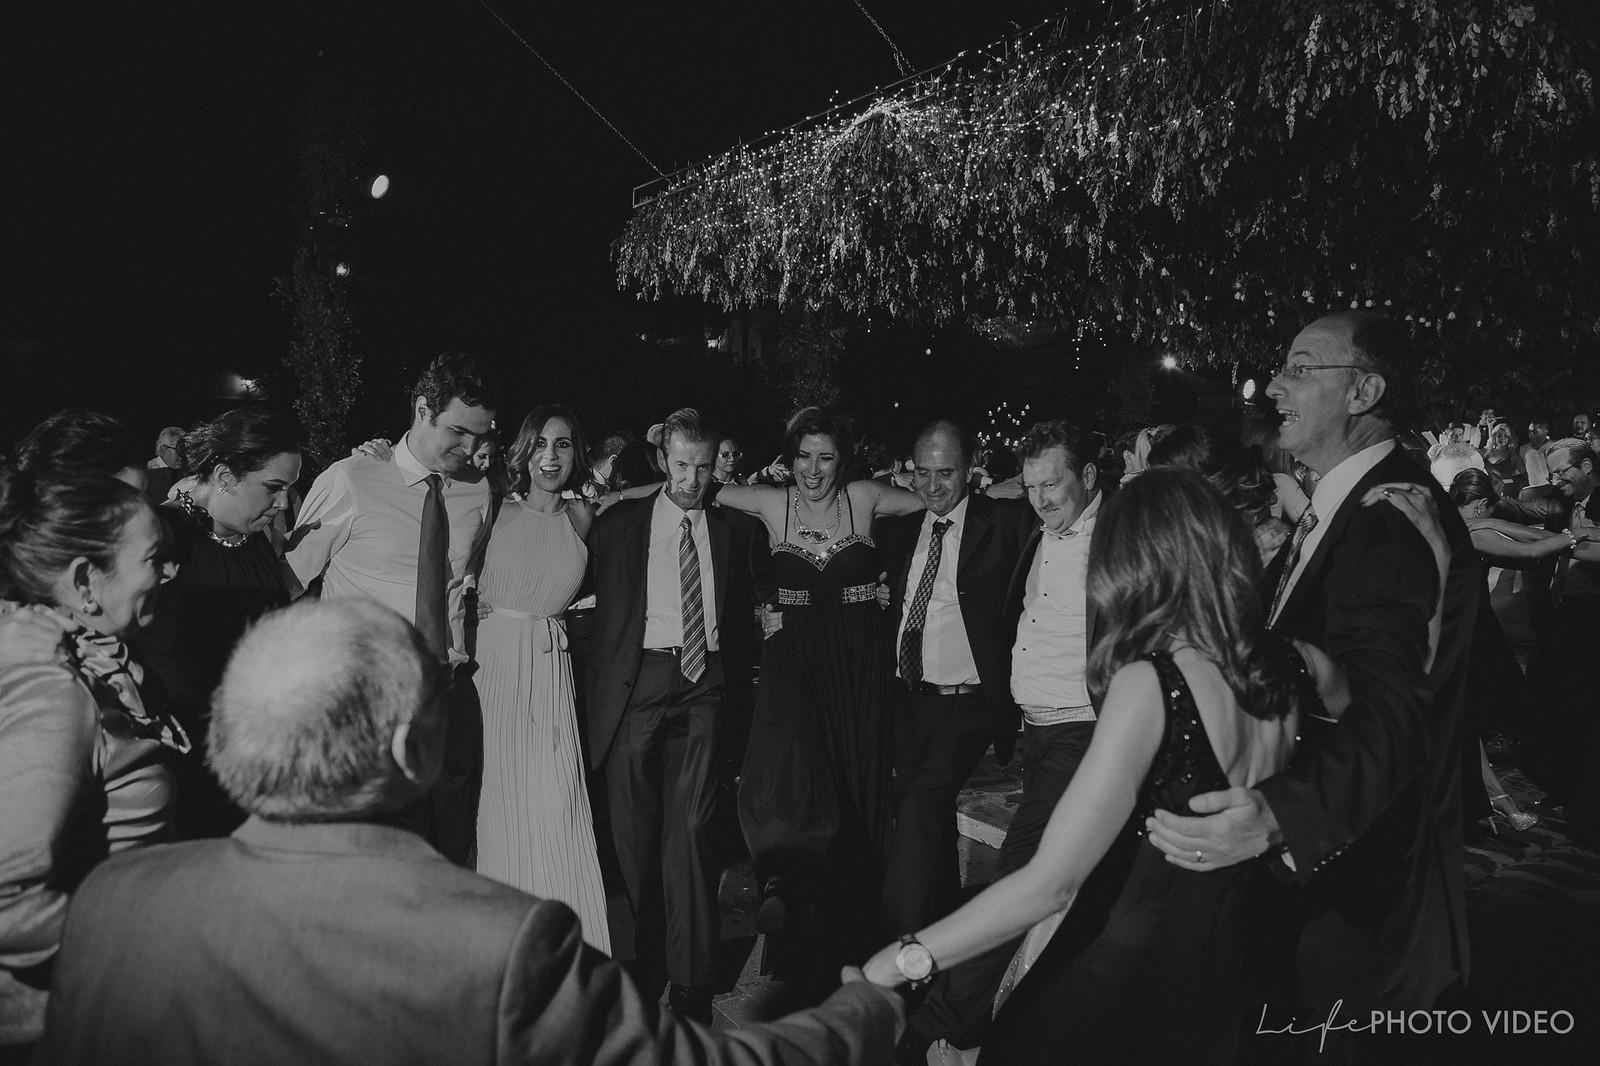 LifePhotoVideo_Boda_Guanajuato_Wedding_0074